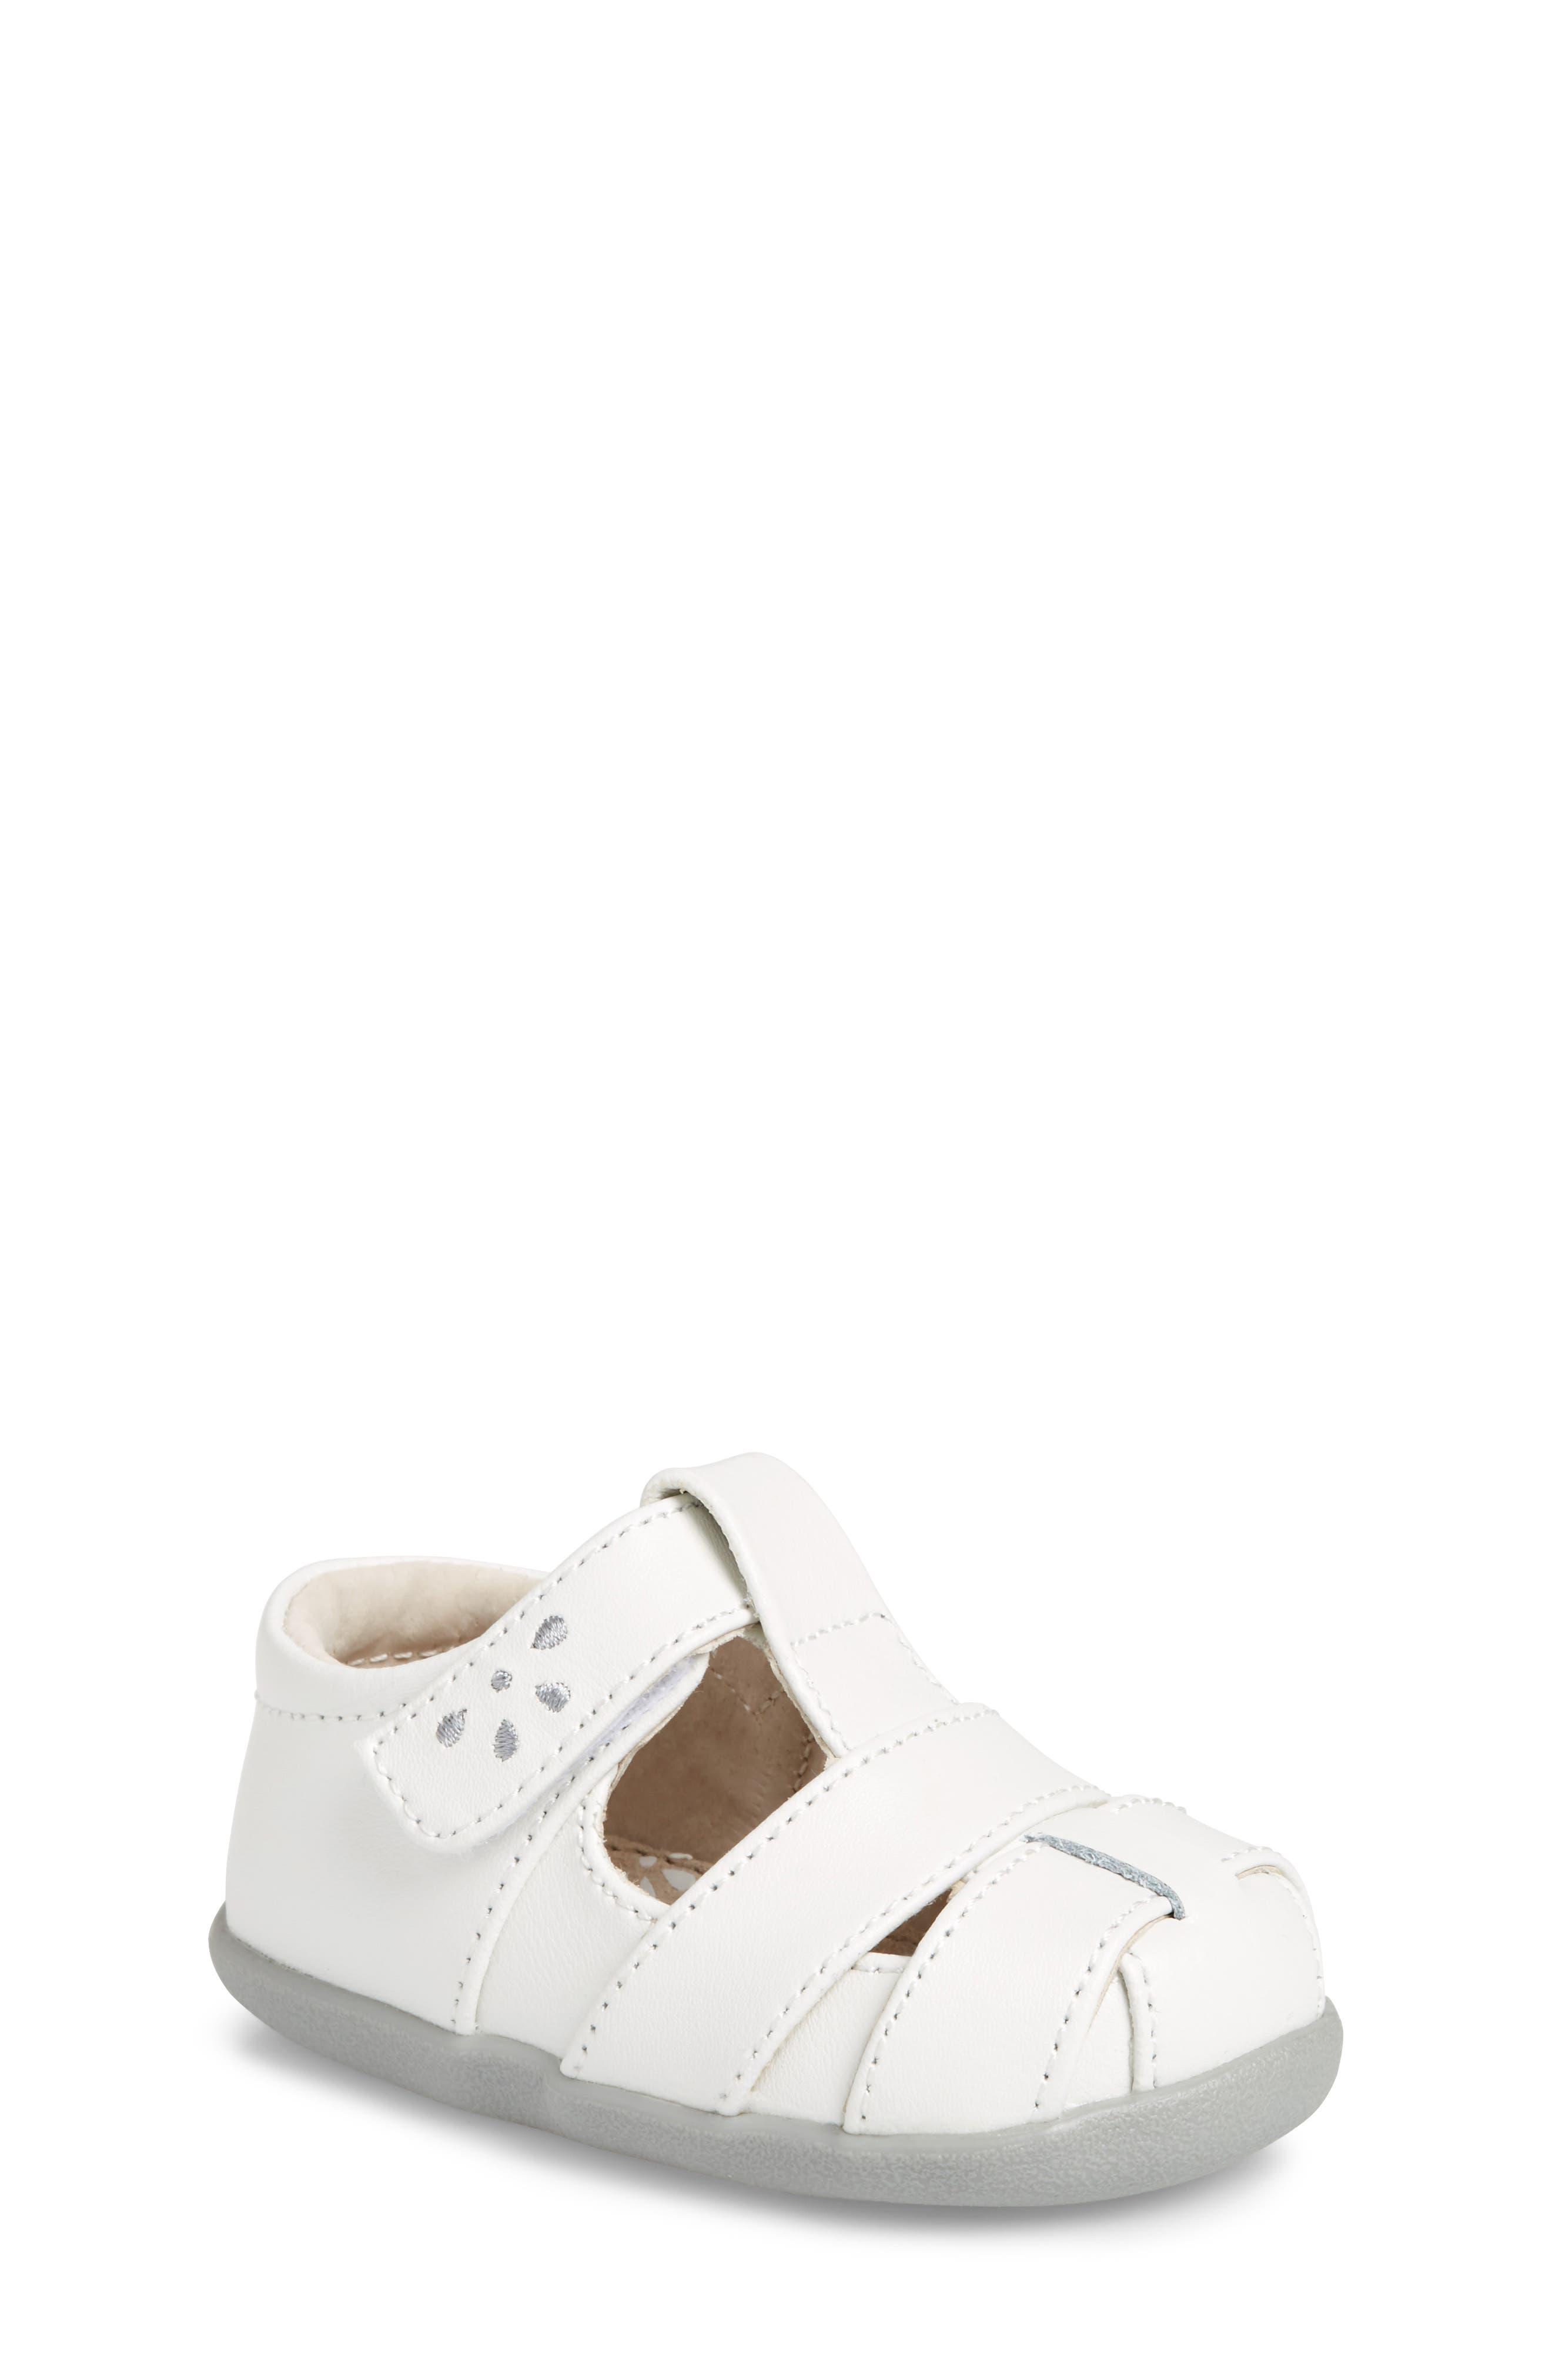 See Kai Run   Brook III Sandal